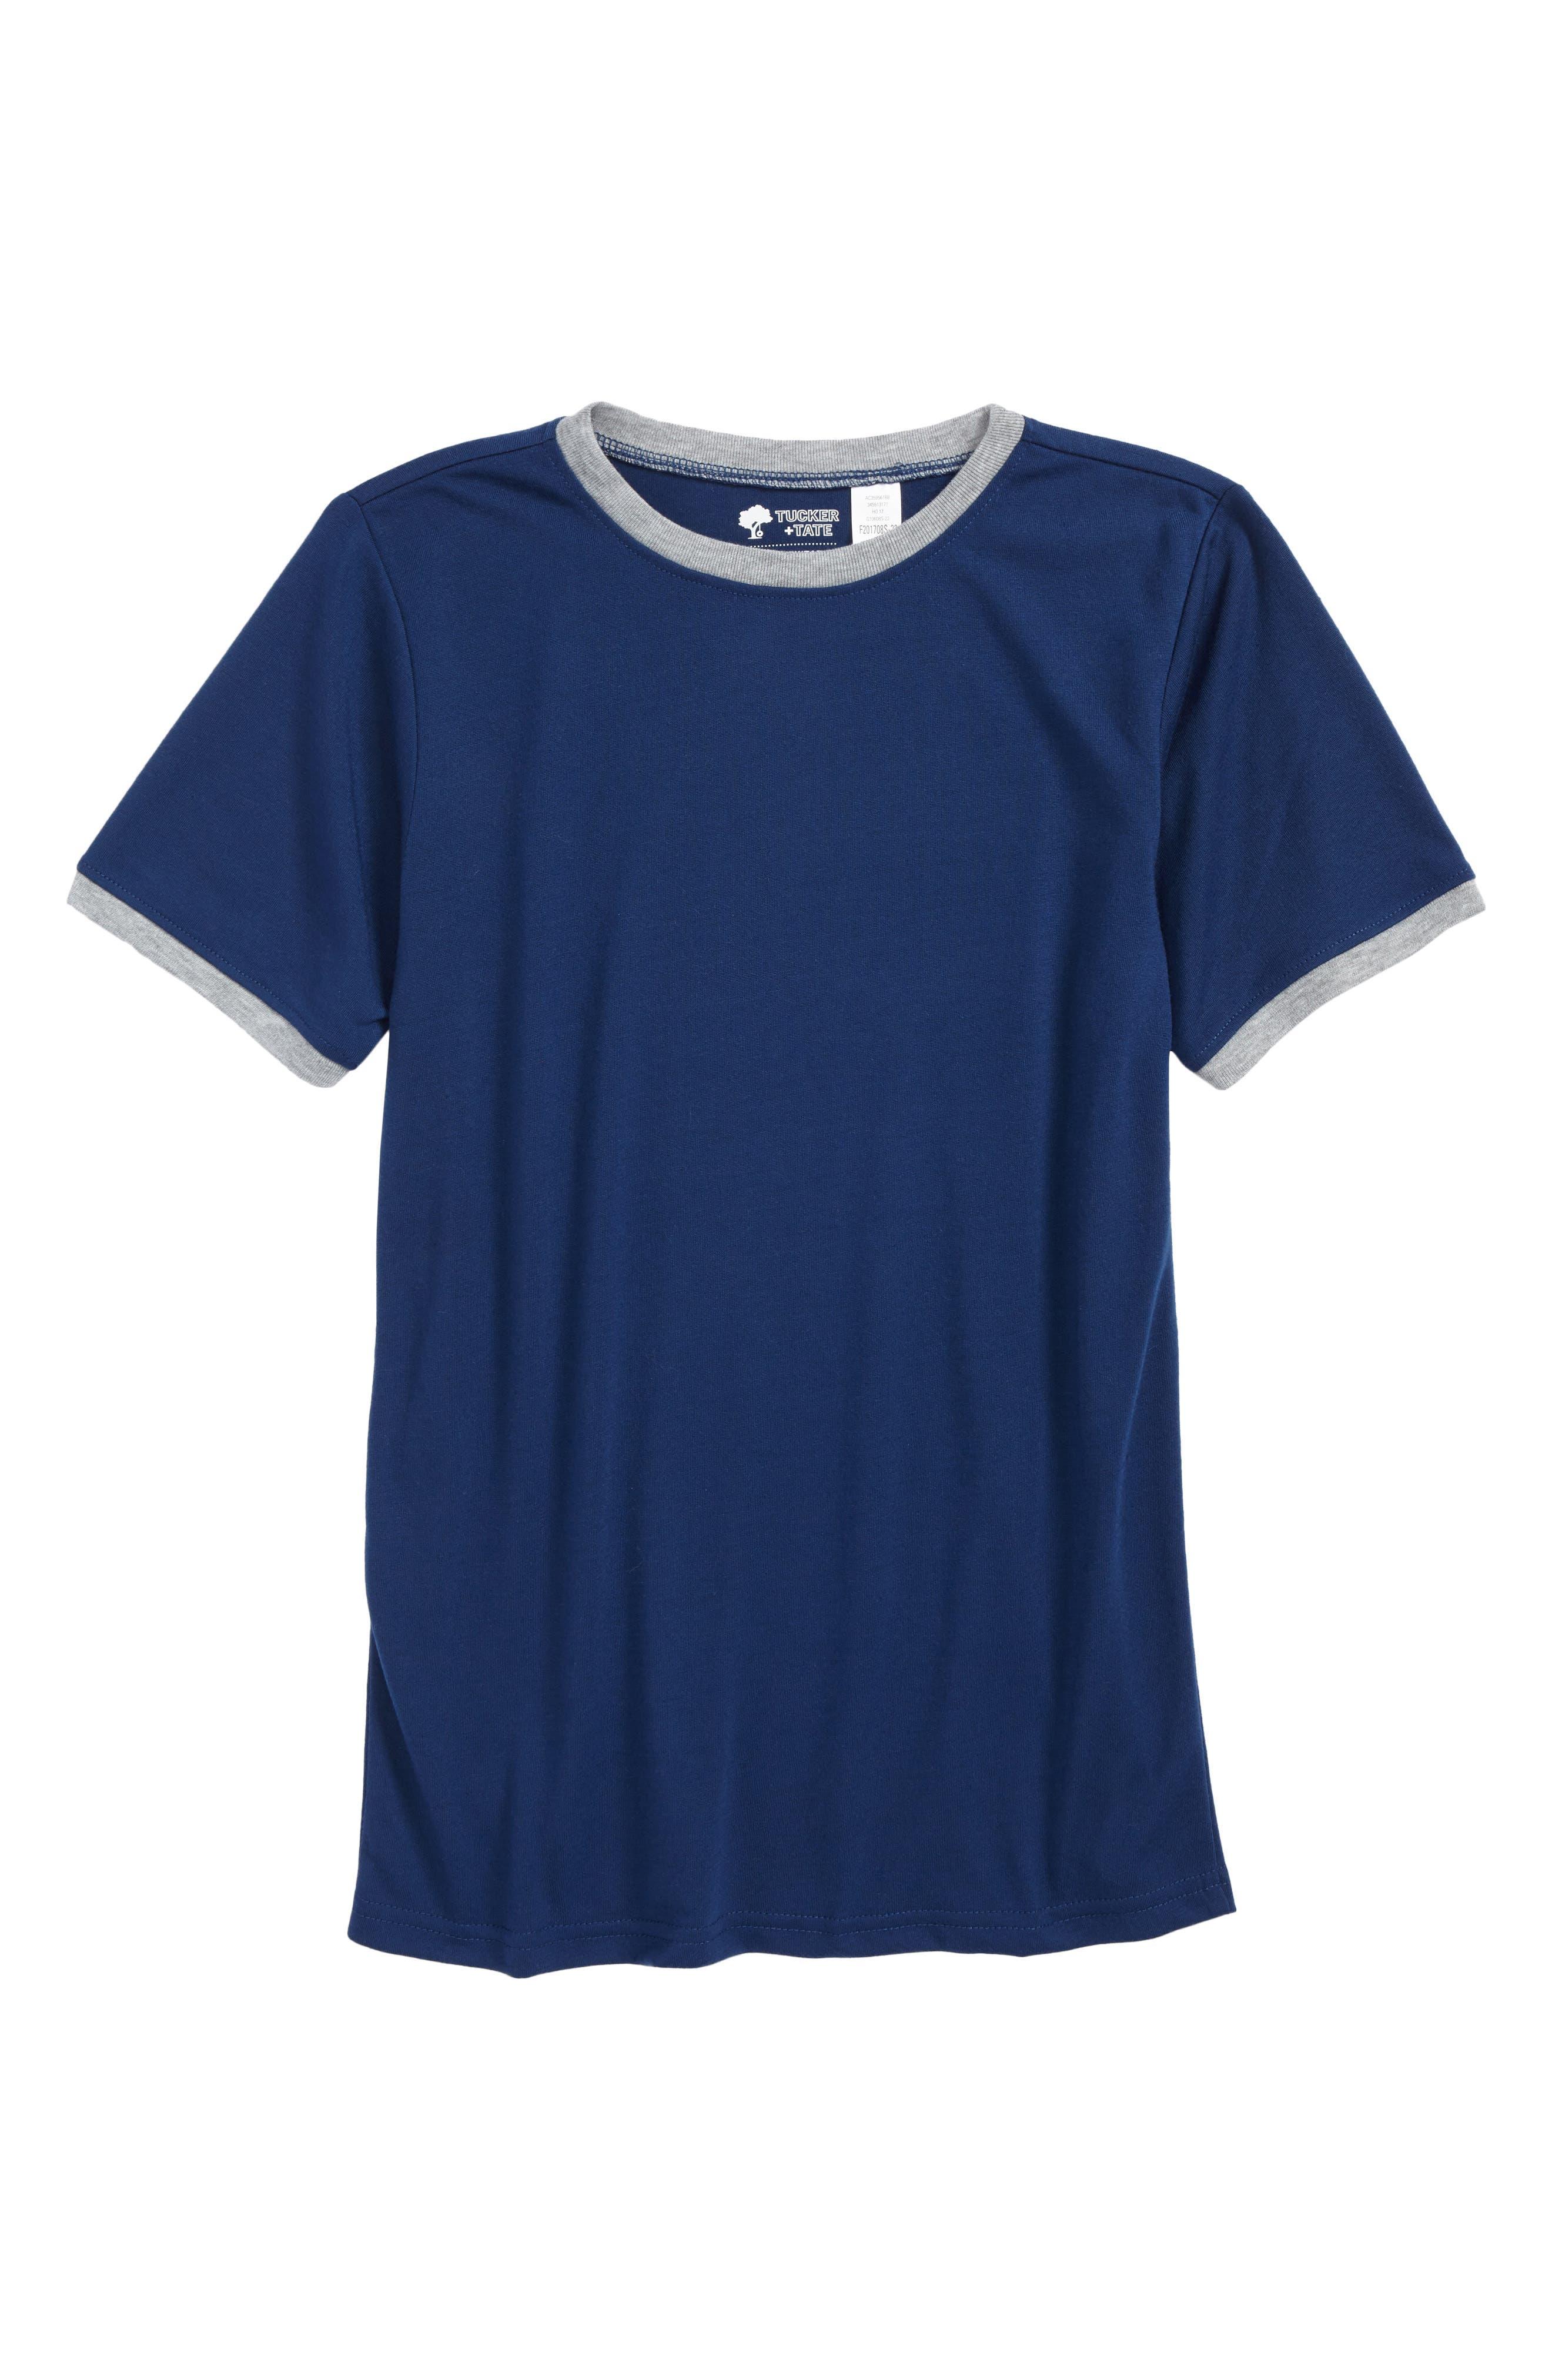 Alternate Image 1 Selected - Tucker + Tate Sleep T-Shirt (Little Boys & Big Boys)